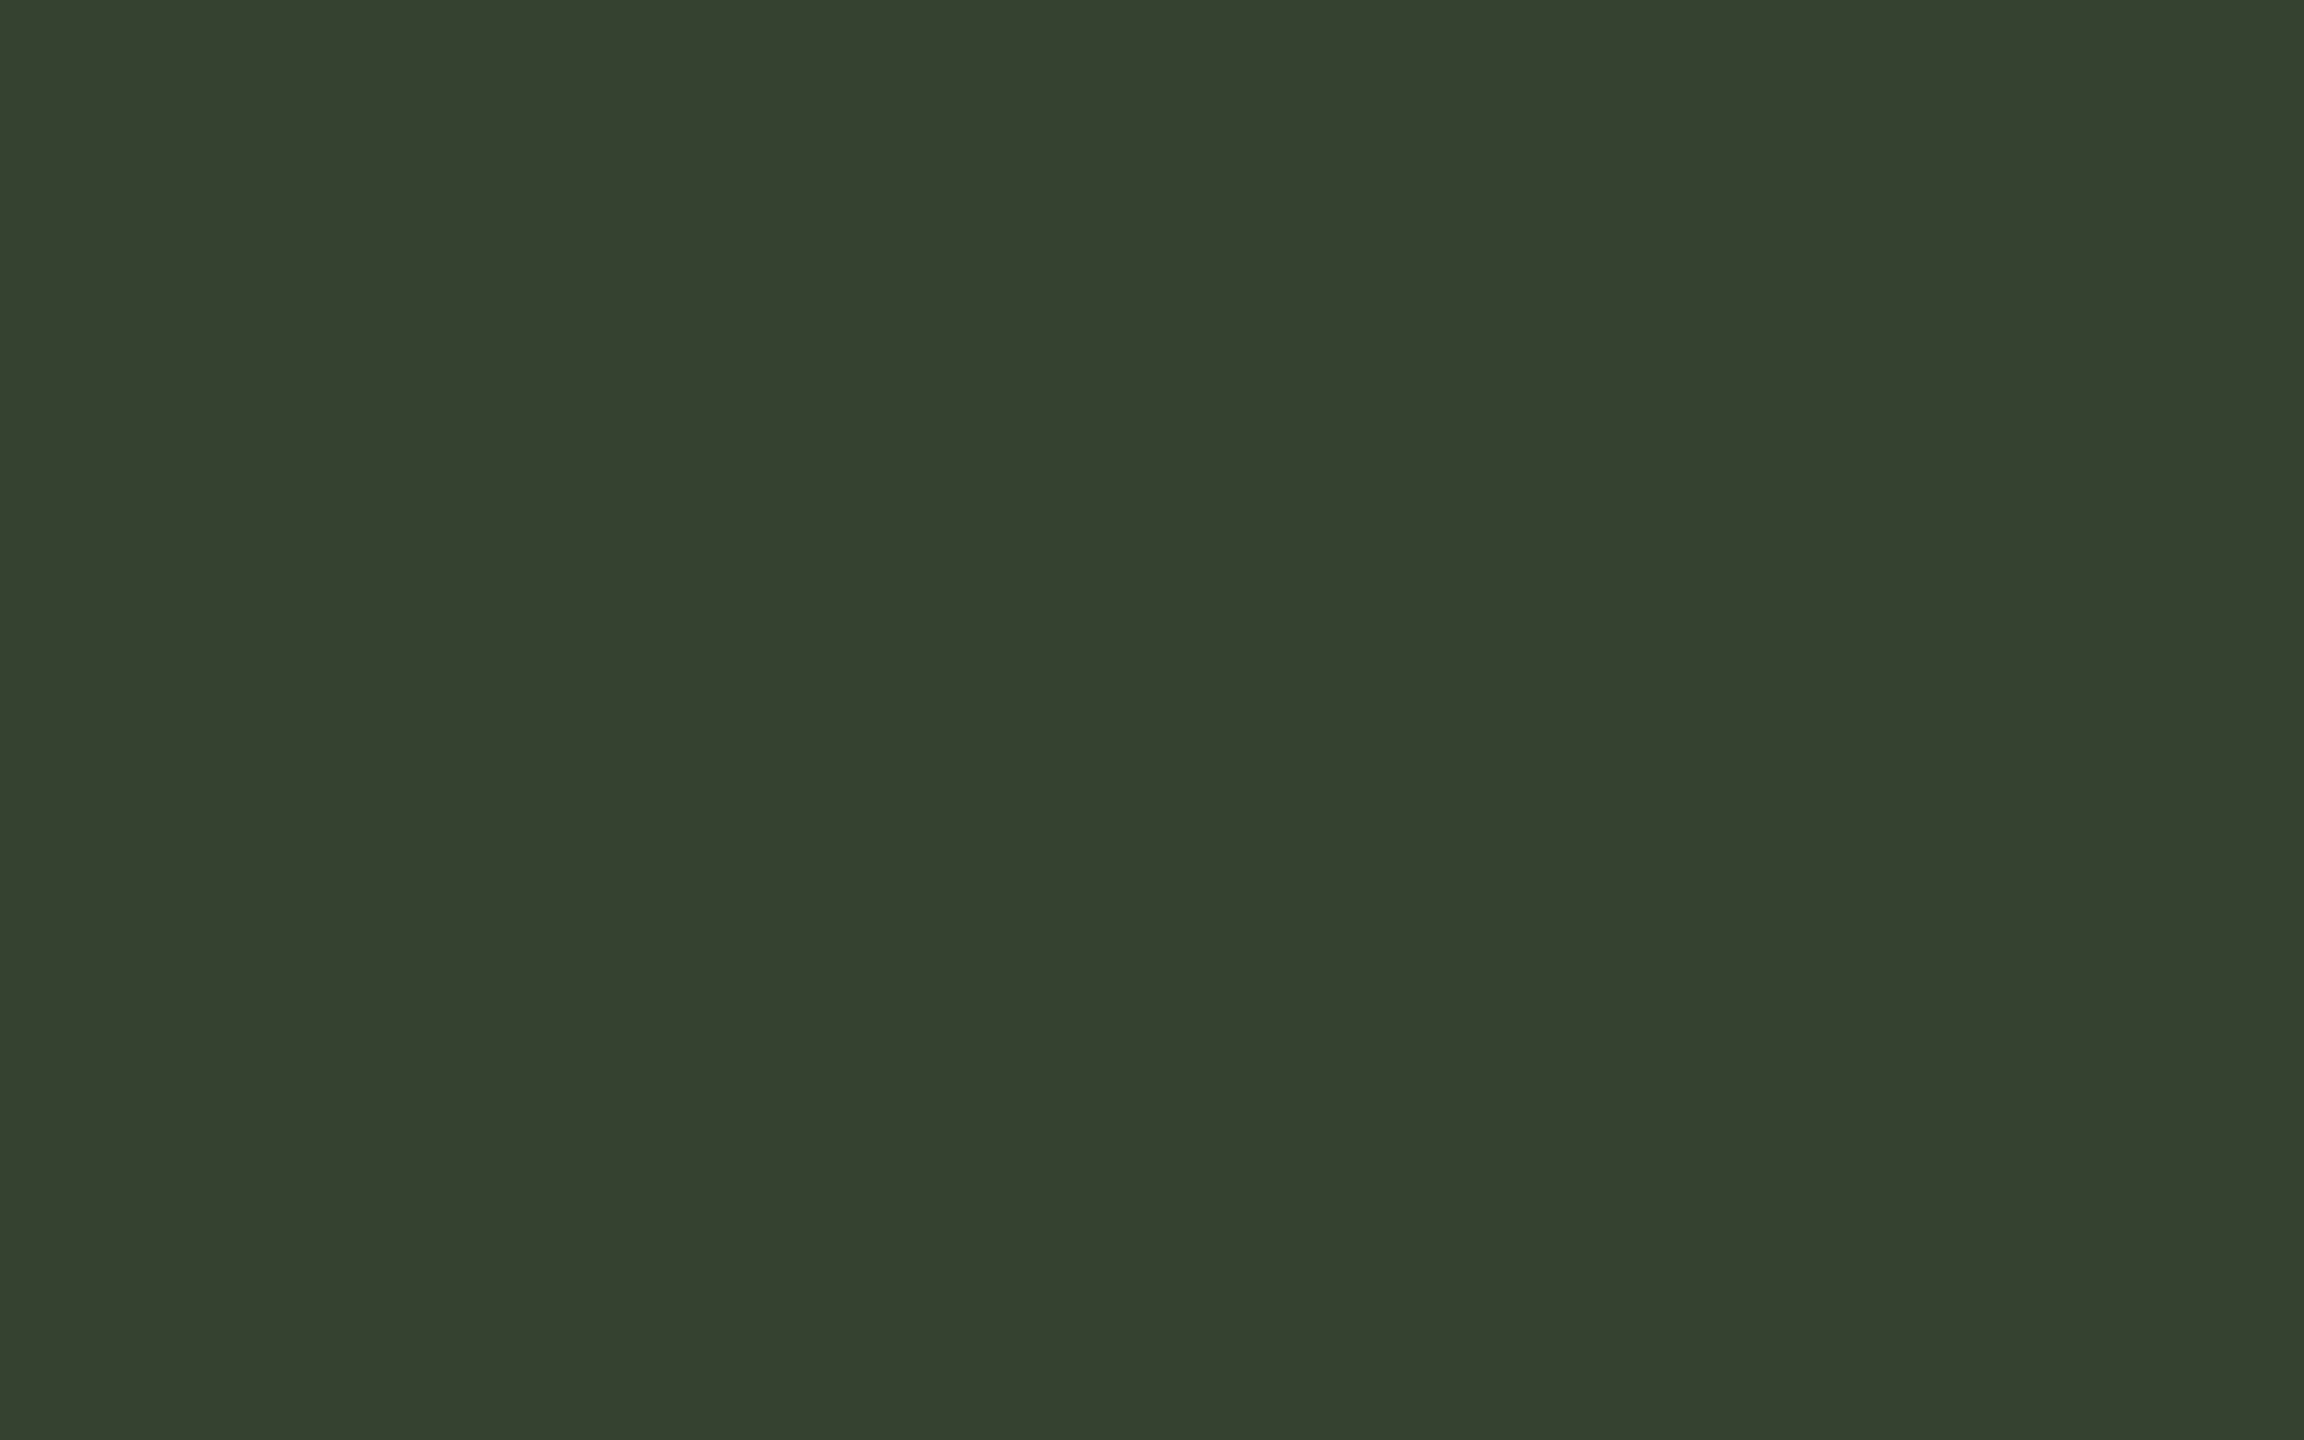 2304x1440 Kombu Green Solid Color Background